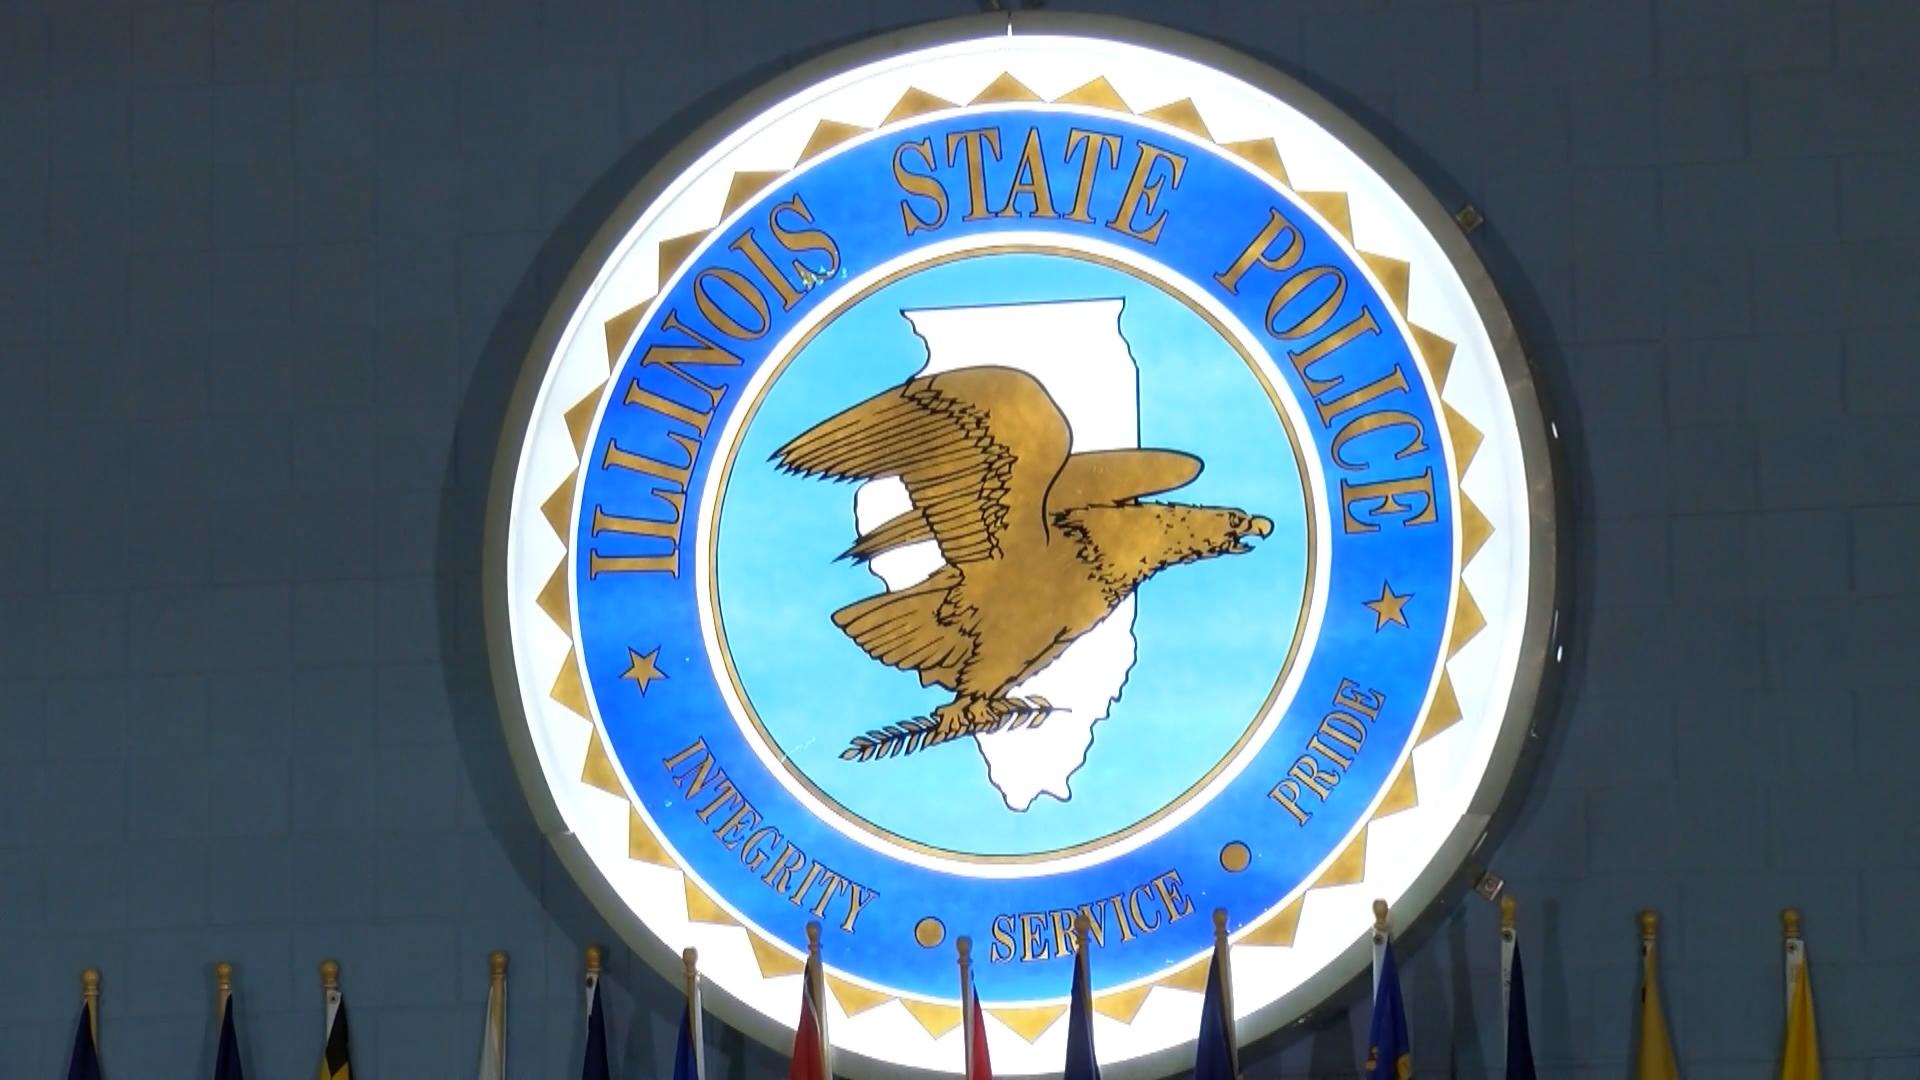 isp illinois state police logo_1490822520549.jpg